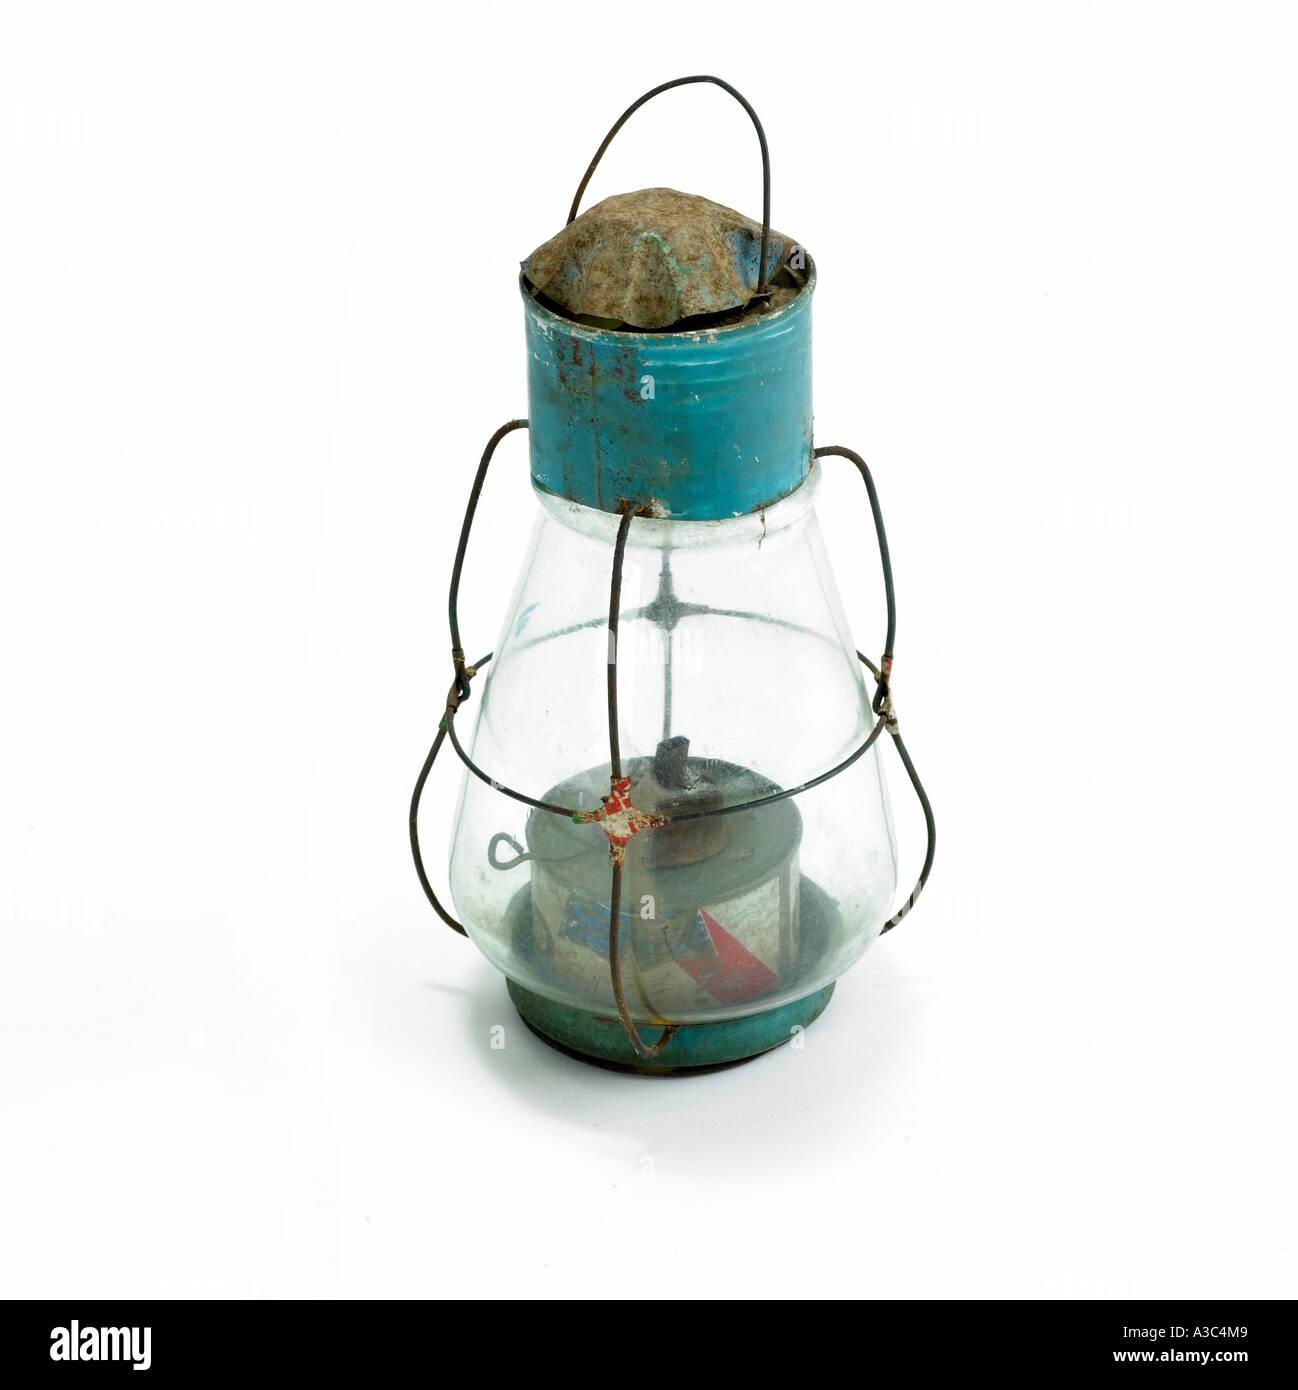 base of a kerosene lamp,object,antique,living arti - Stock Image